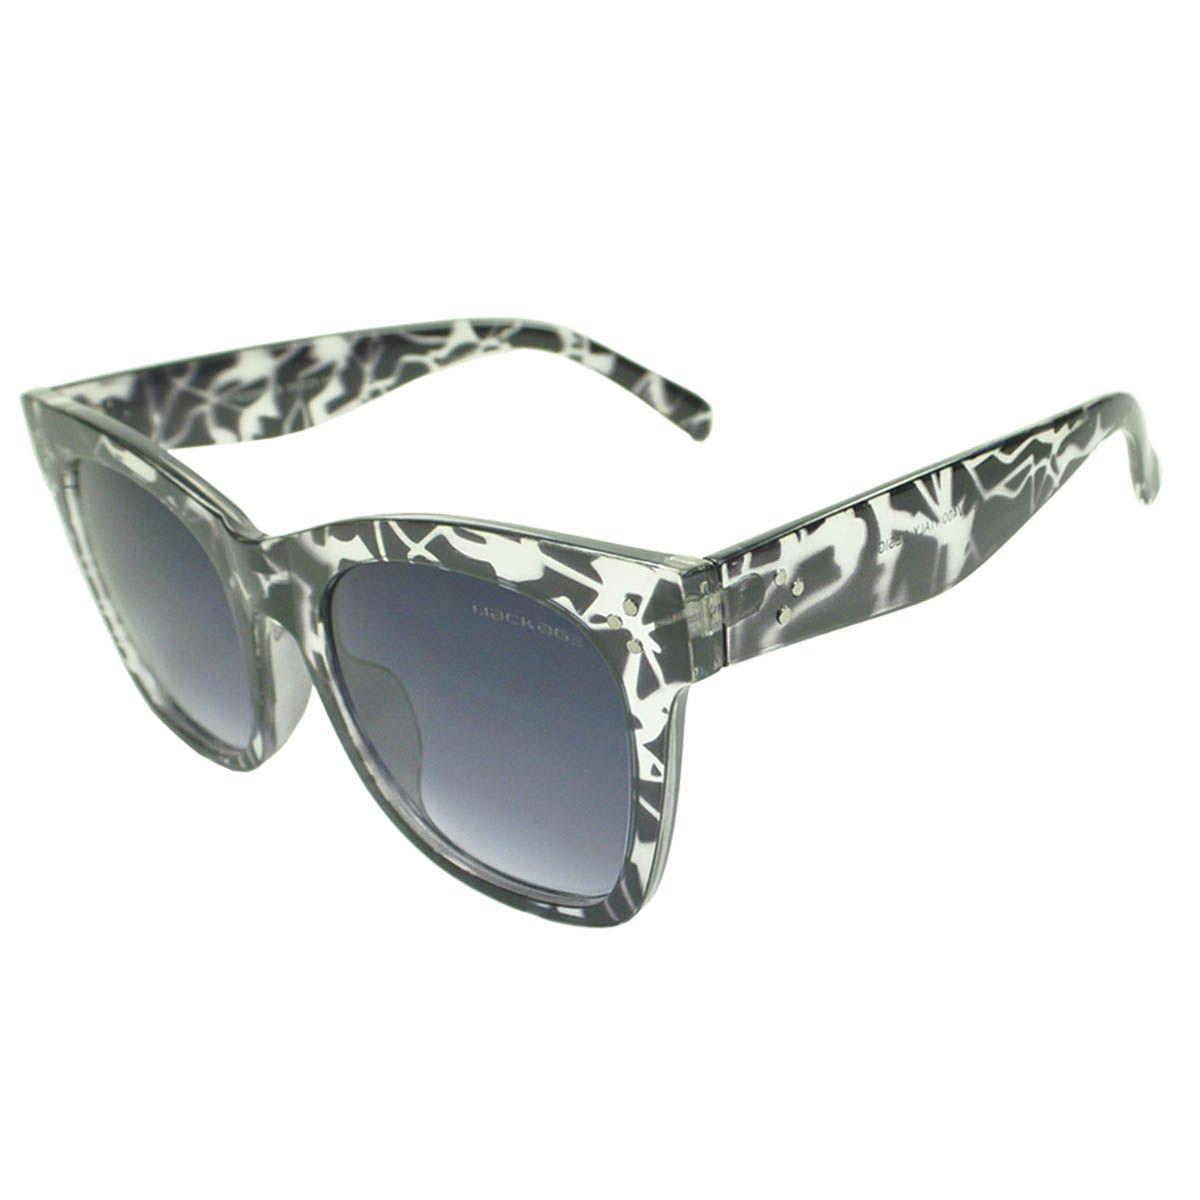 4d2bd43b2 MACKAGE BRASIL | Comprar Óculos de Sol Online é Aqui Acesse já!